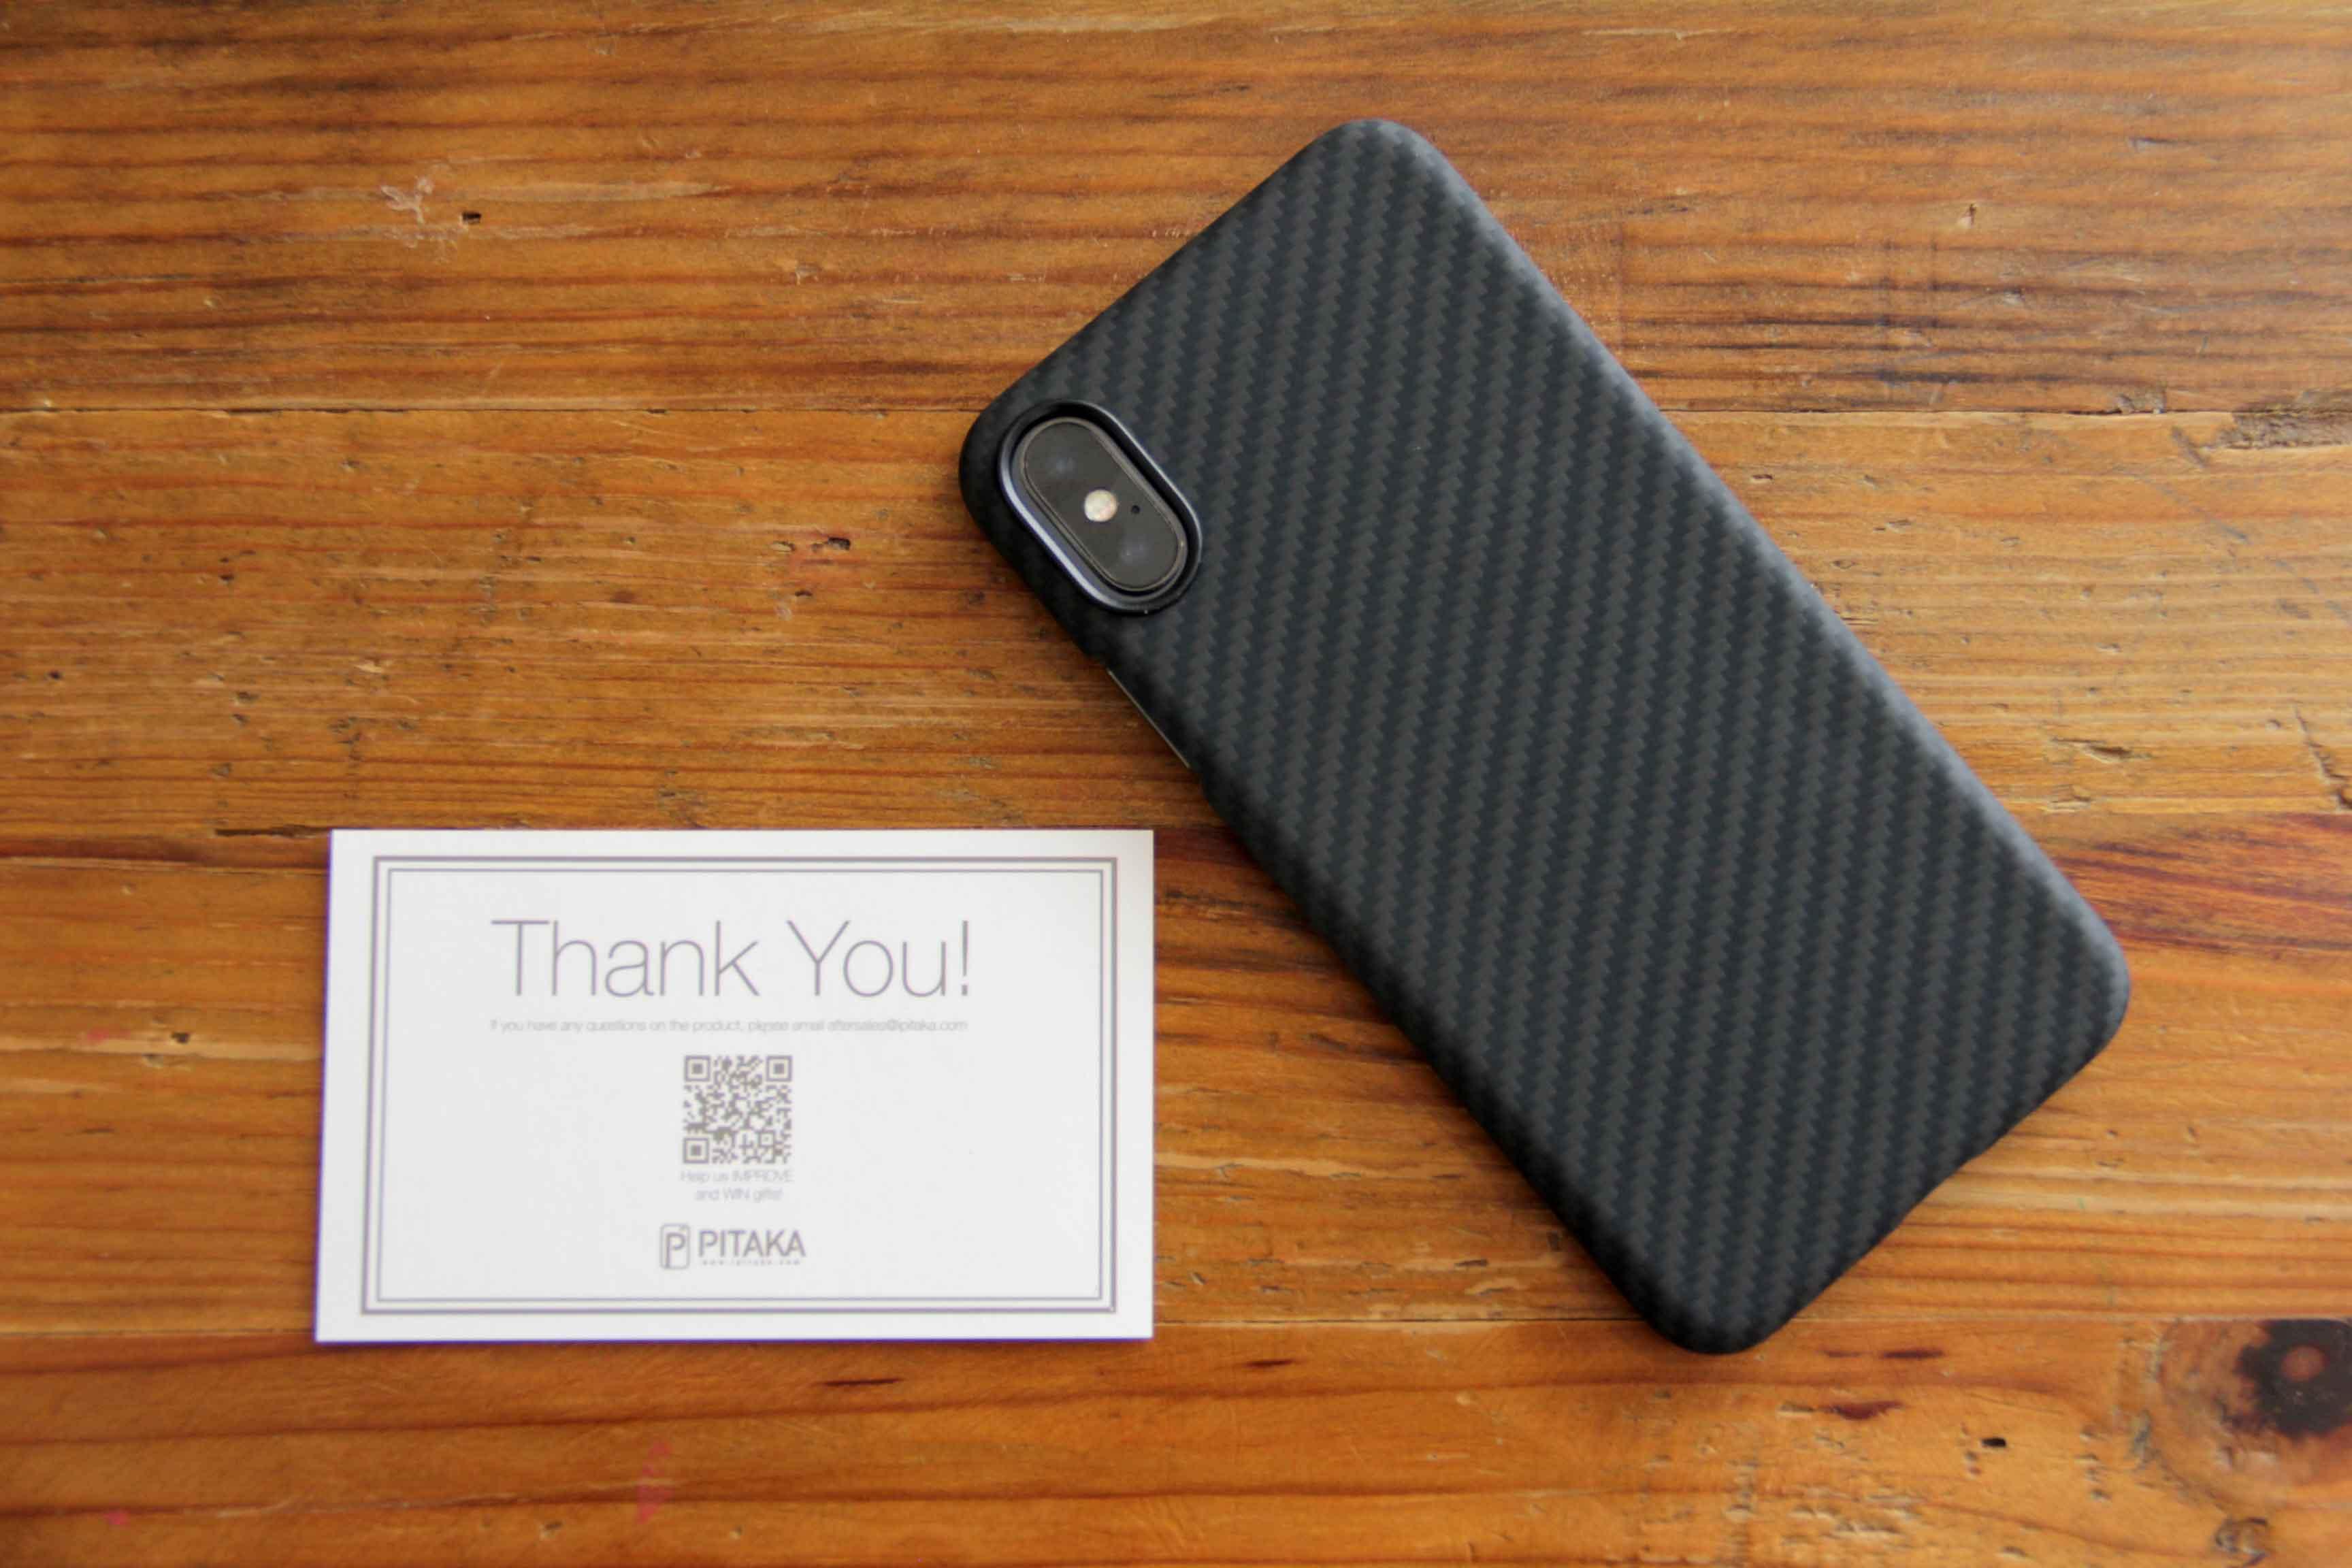 PITAKA iPhoneXケース装着レビュー